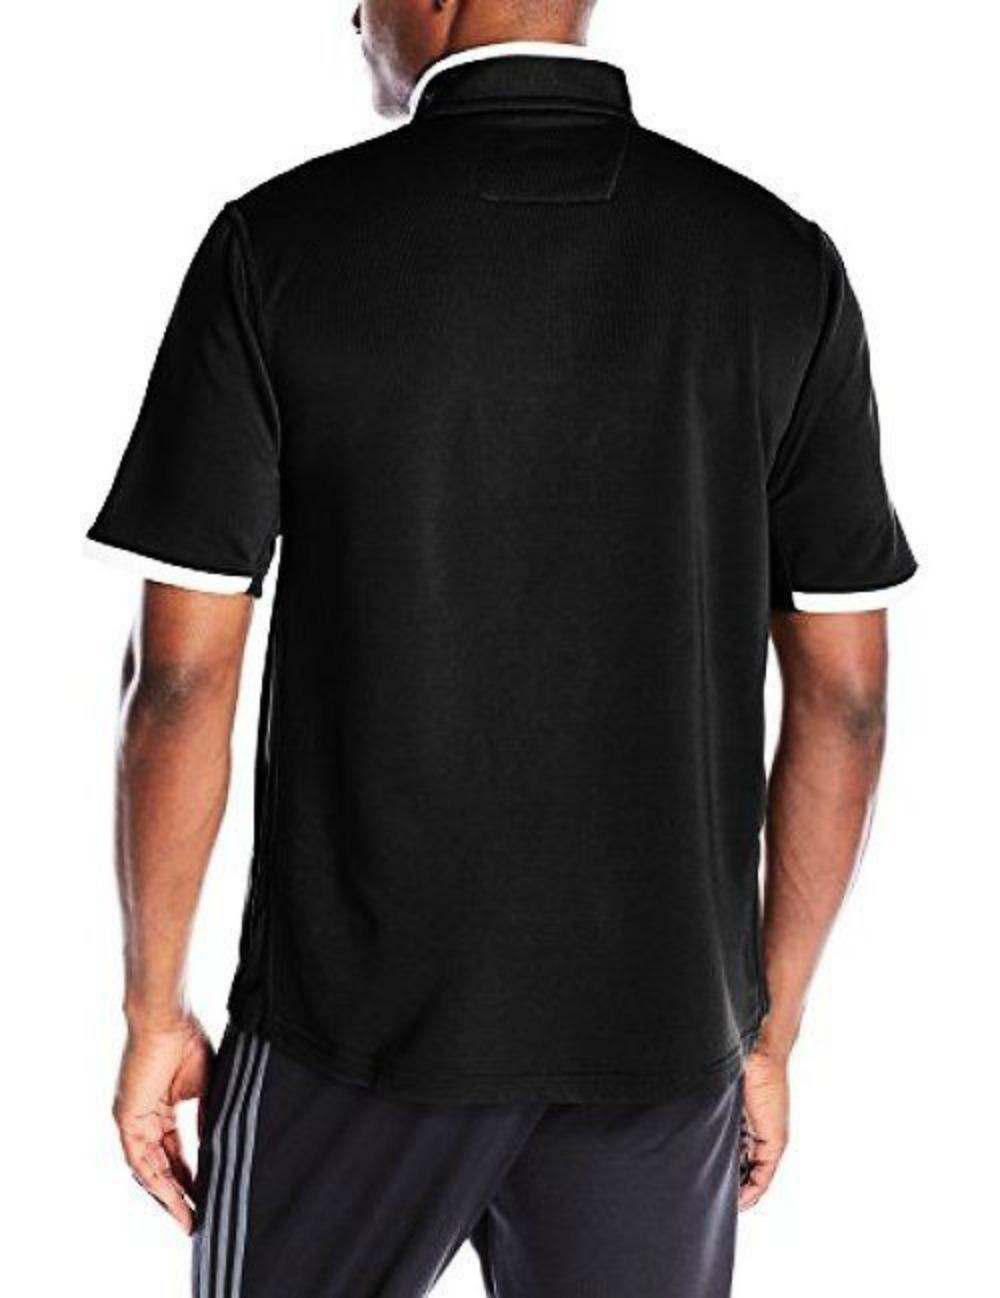 Adidas Men's Climalite Shockwave Short Sleeve 1/4 Zip Jacket ...